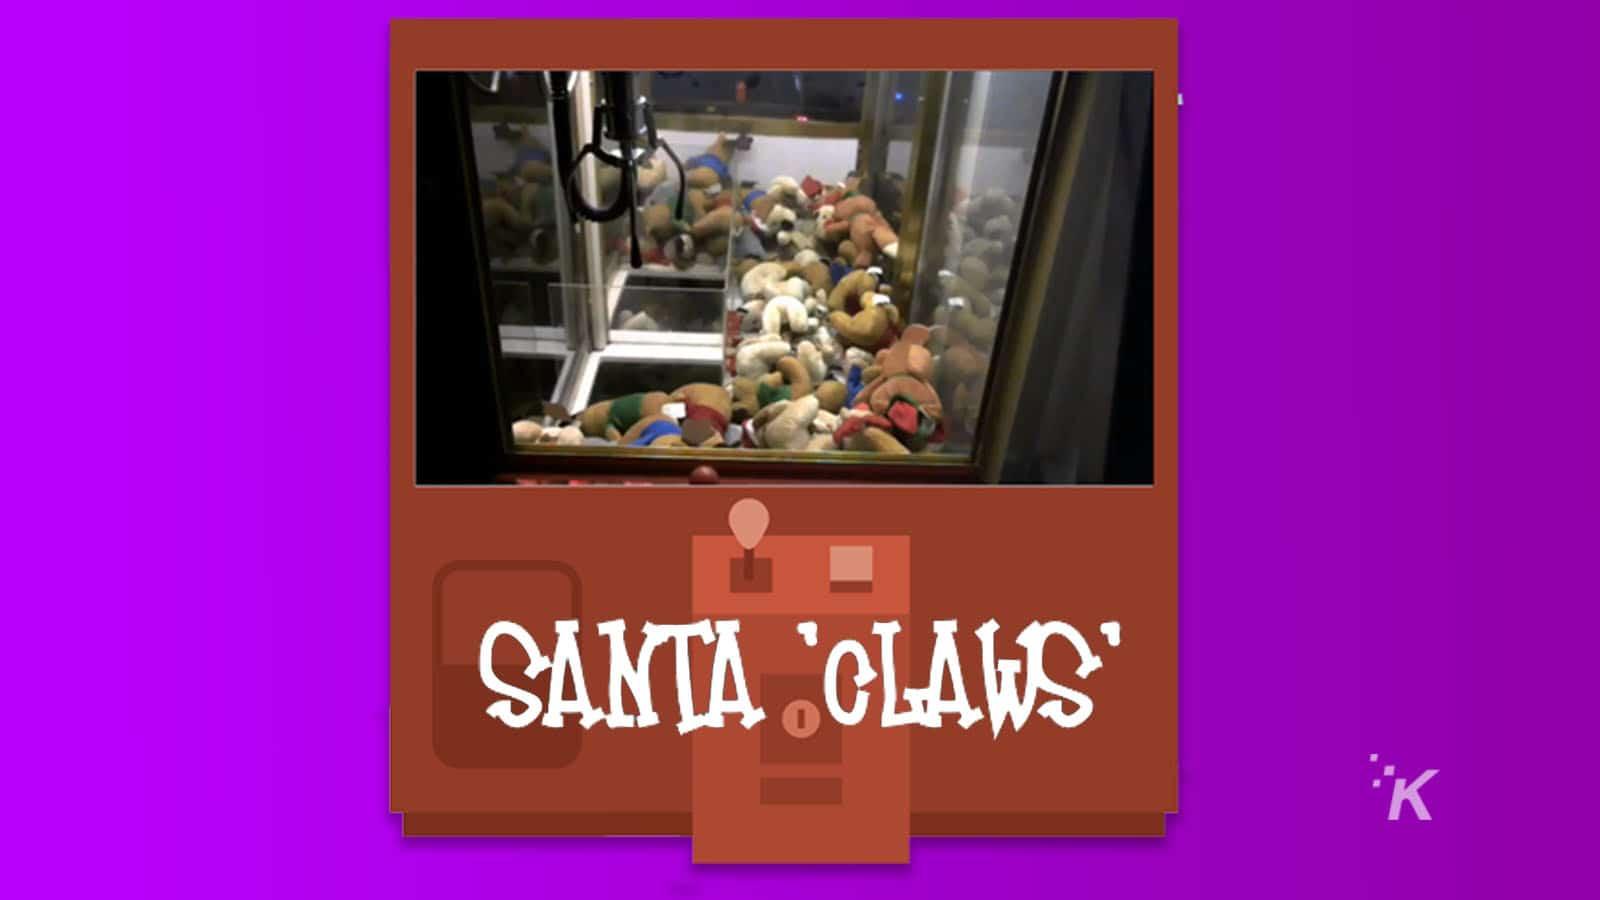 santa claws claw machine for charity